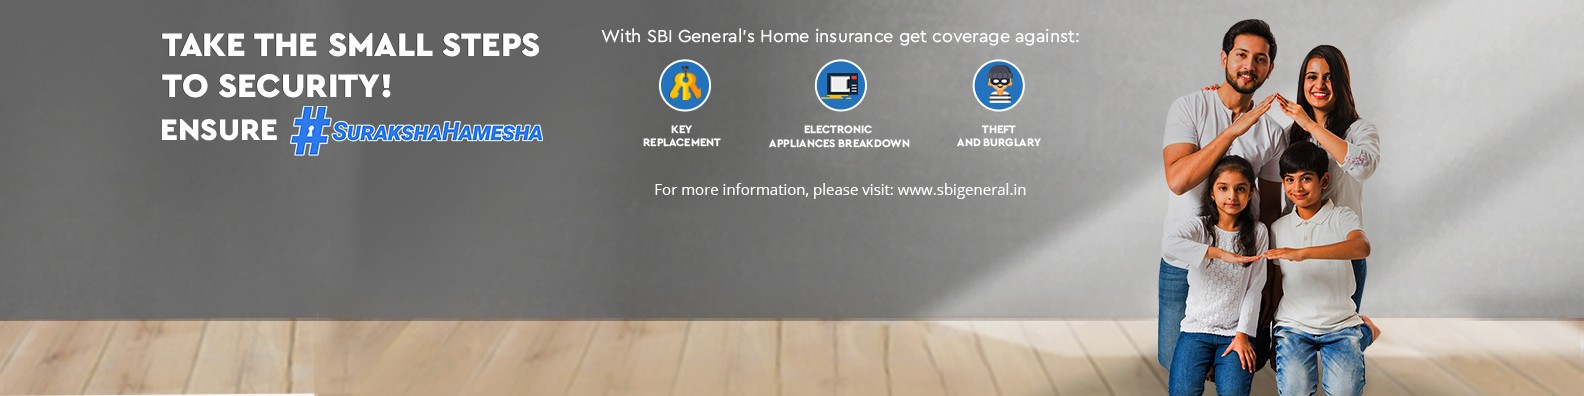 Sbi Home Insurance Policy - Home Sweet Home | Modern ...